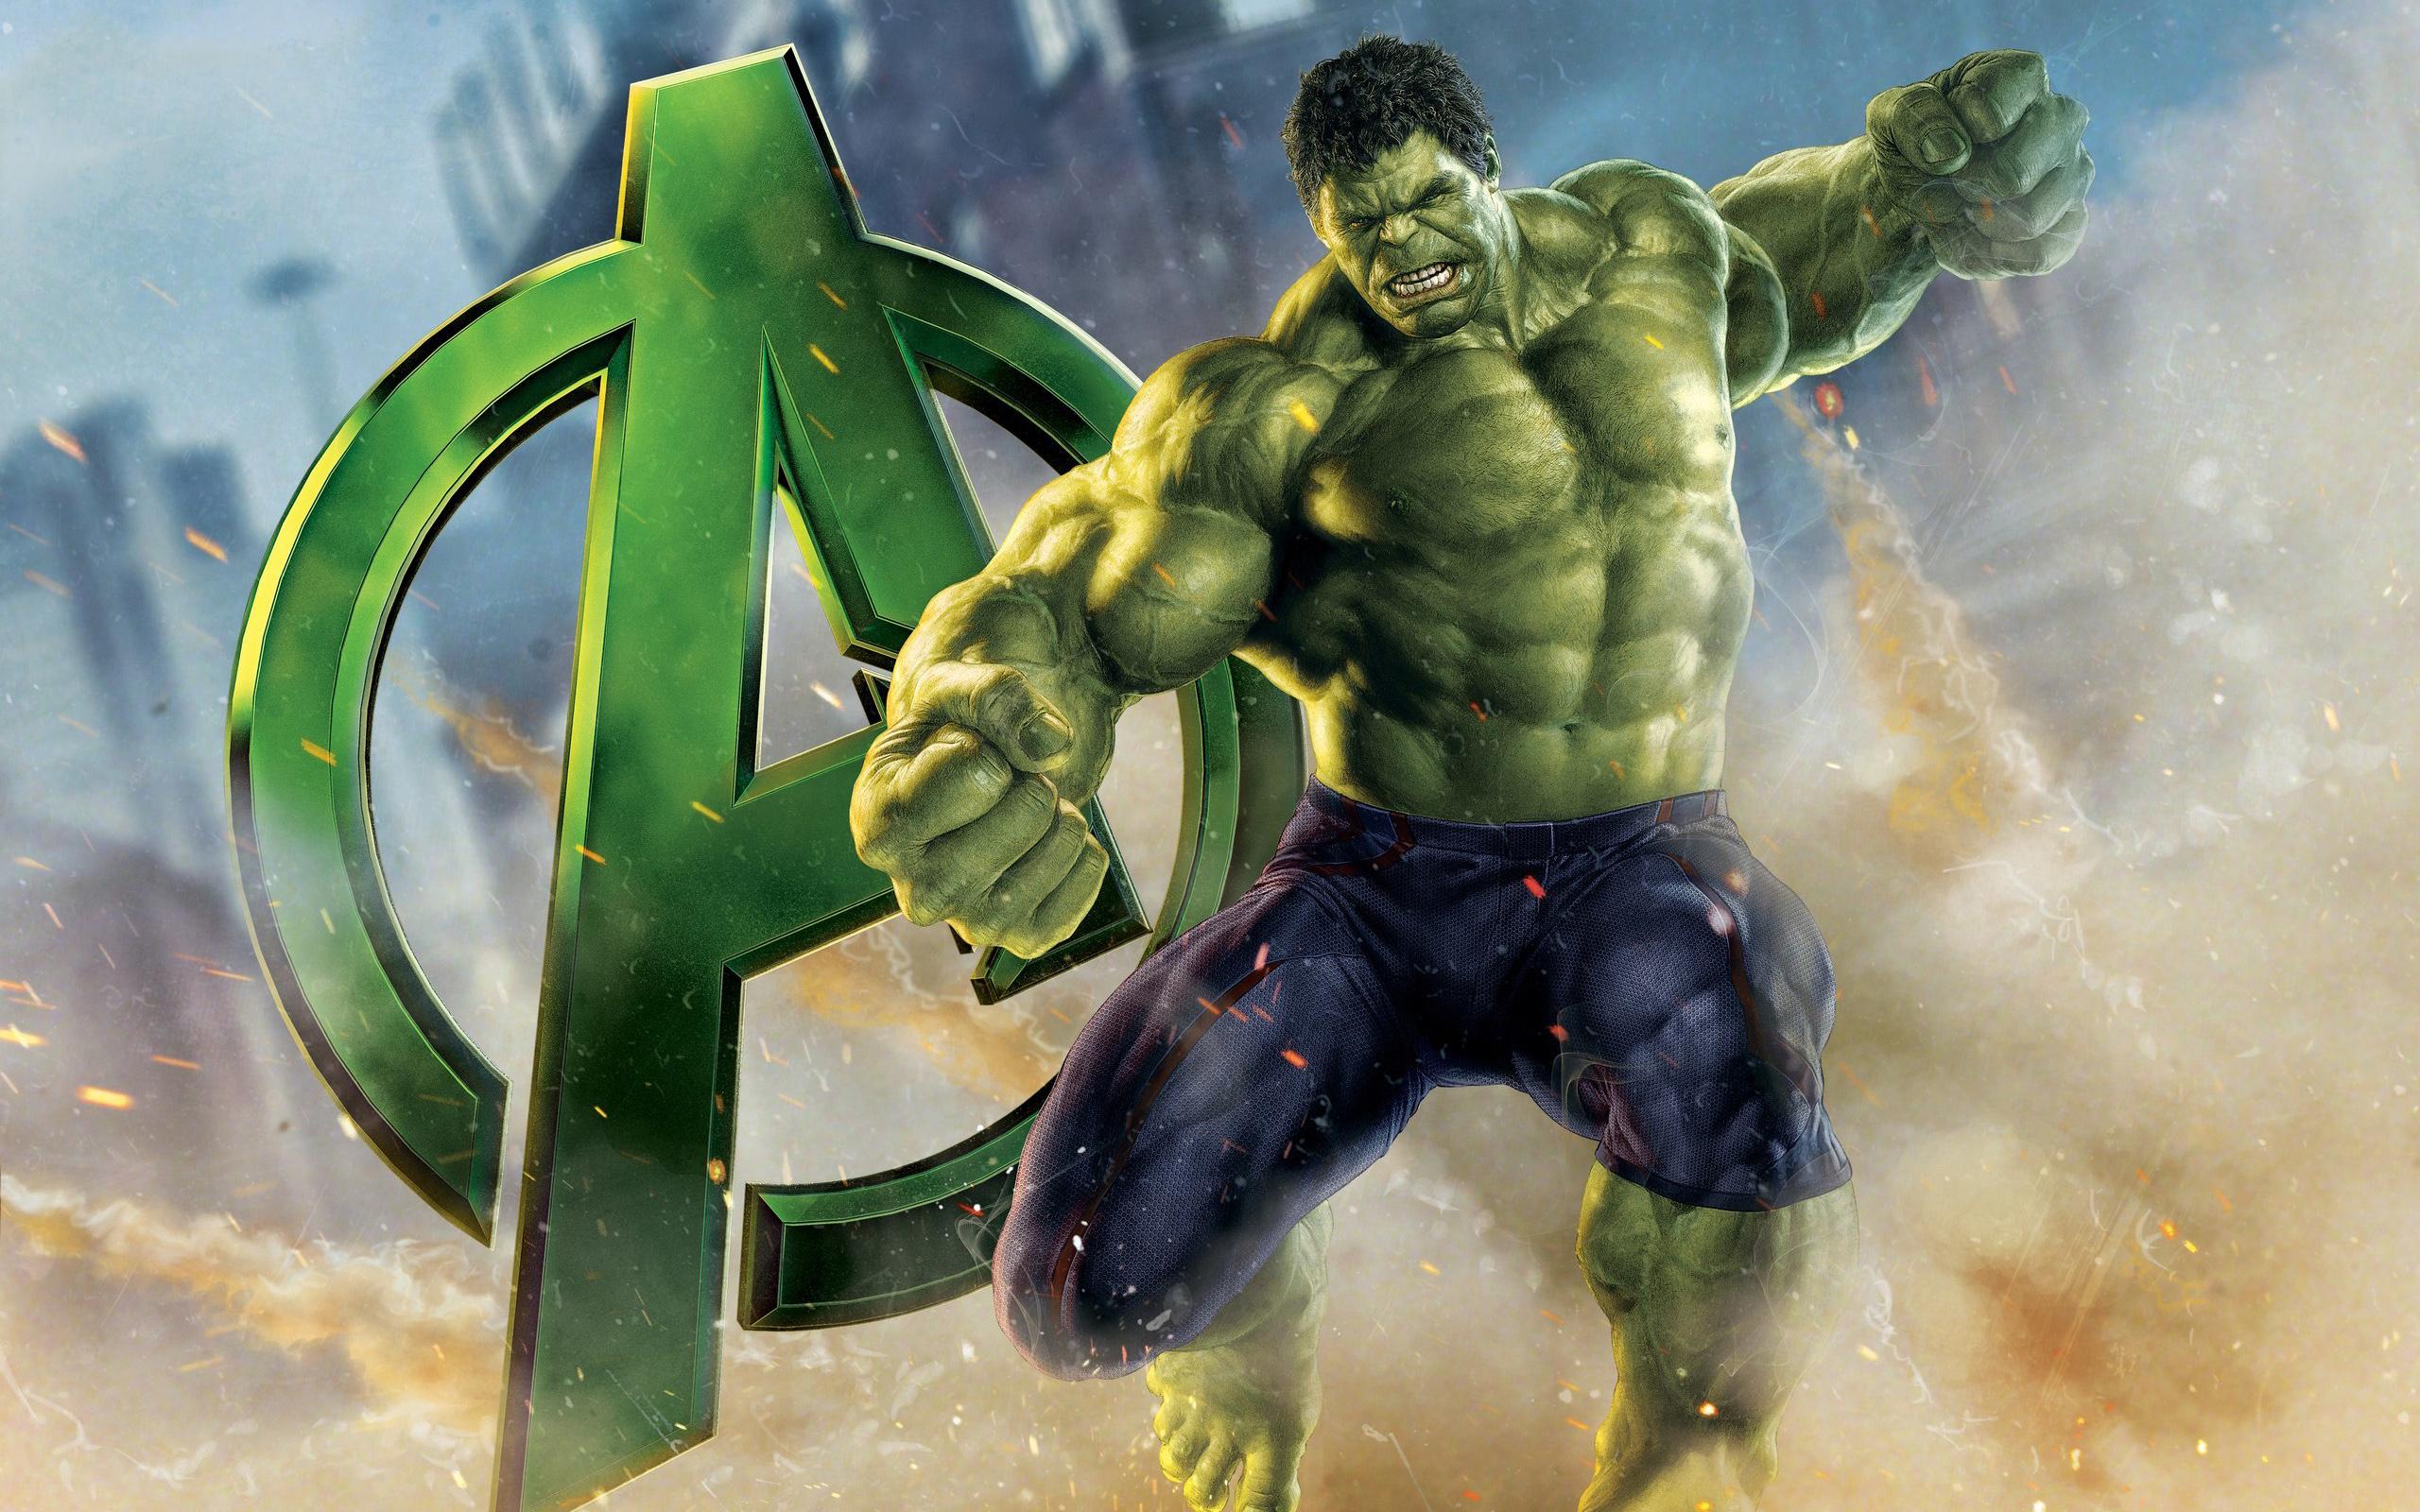 Hulk Wallpaper Desktop 4K FHDQ Images LLGL Wallpapers 2560x1600